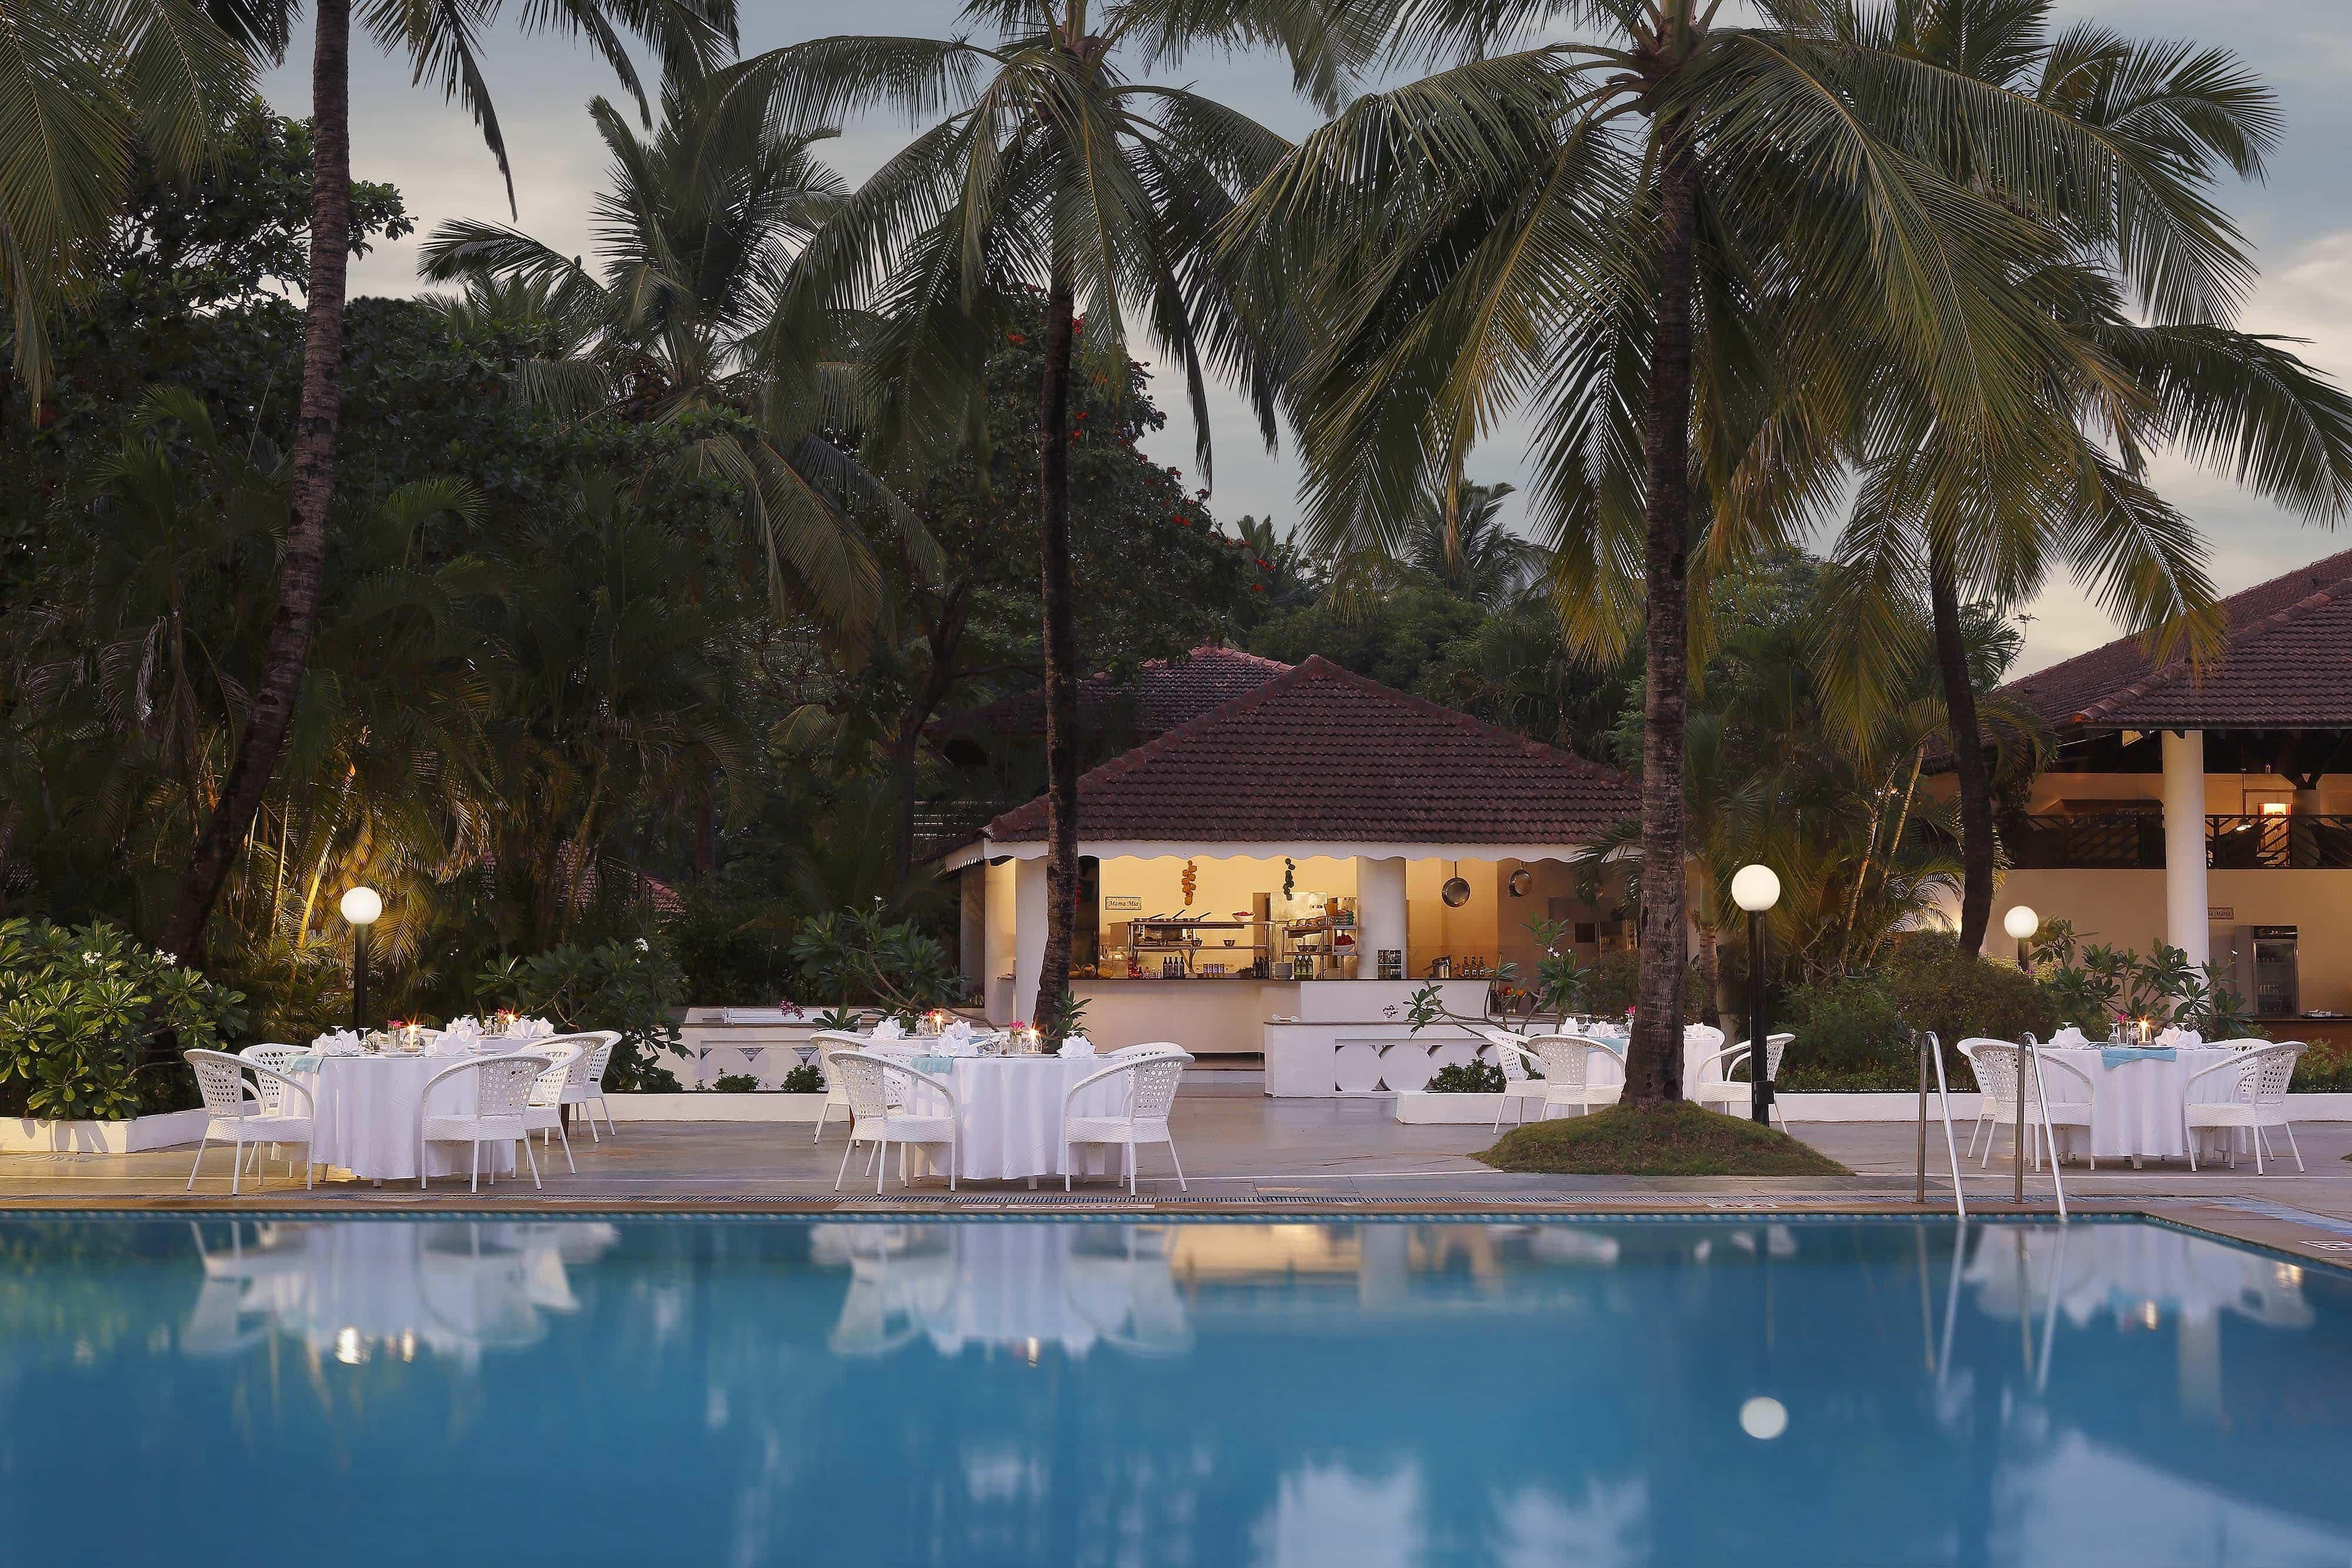 VALENTINES DAY 2019 | ROMANTIC DESTINATIONS | ROMANTIC HOTELS | INDIA DESTINATIONS